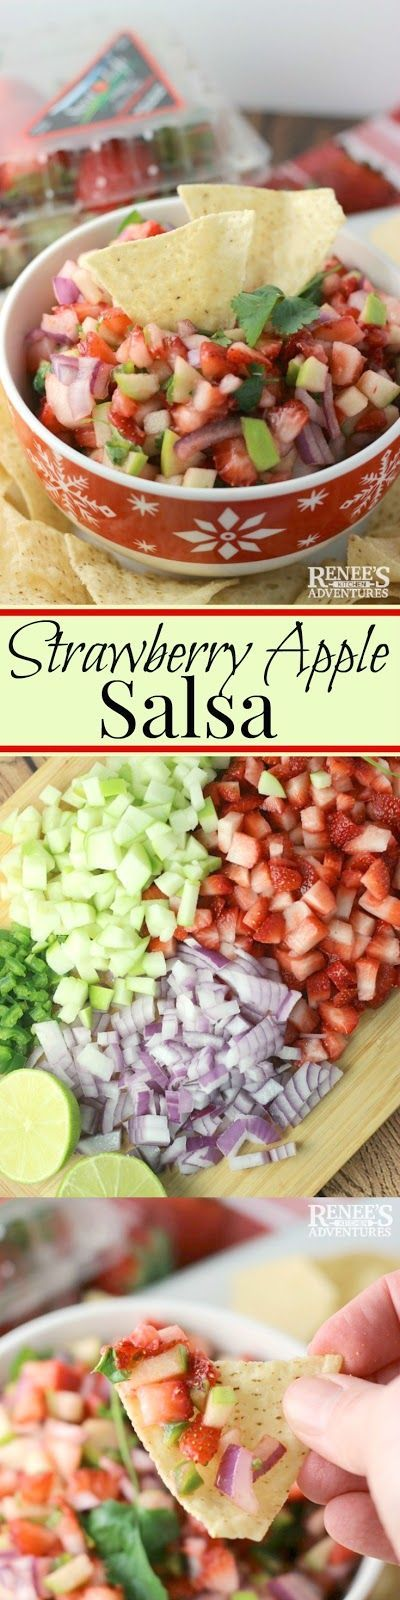 Strawberry Apple Salsa | Renee's Kitchen Adventures - easy recipe for strawberry apple salsa appetizer. Spicy, jalapeno, strawberry, apple @Flastrawberries #SundaySupper #FLstrawberry